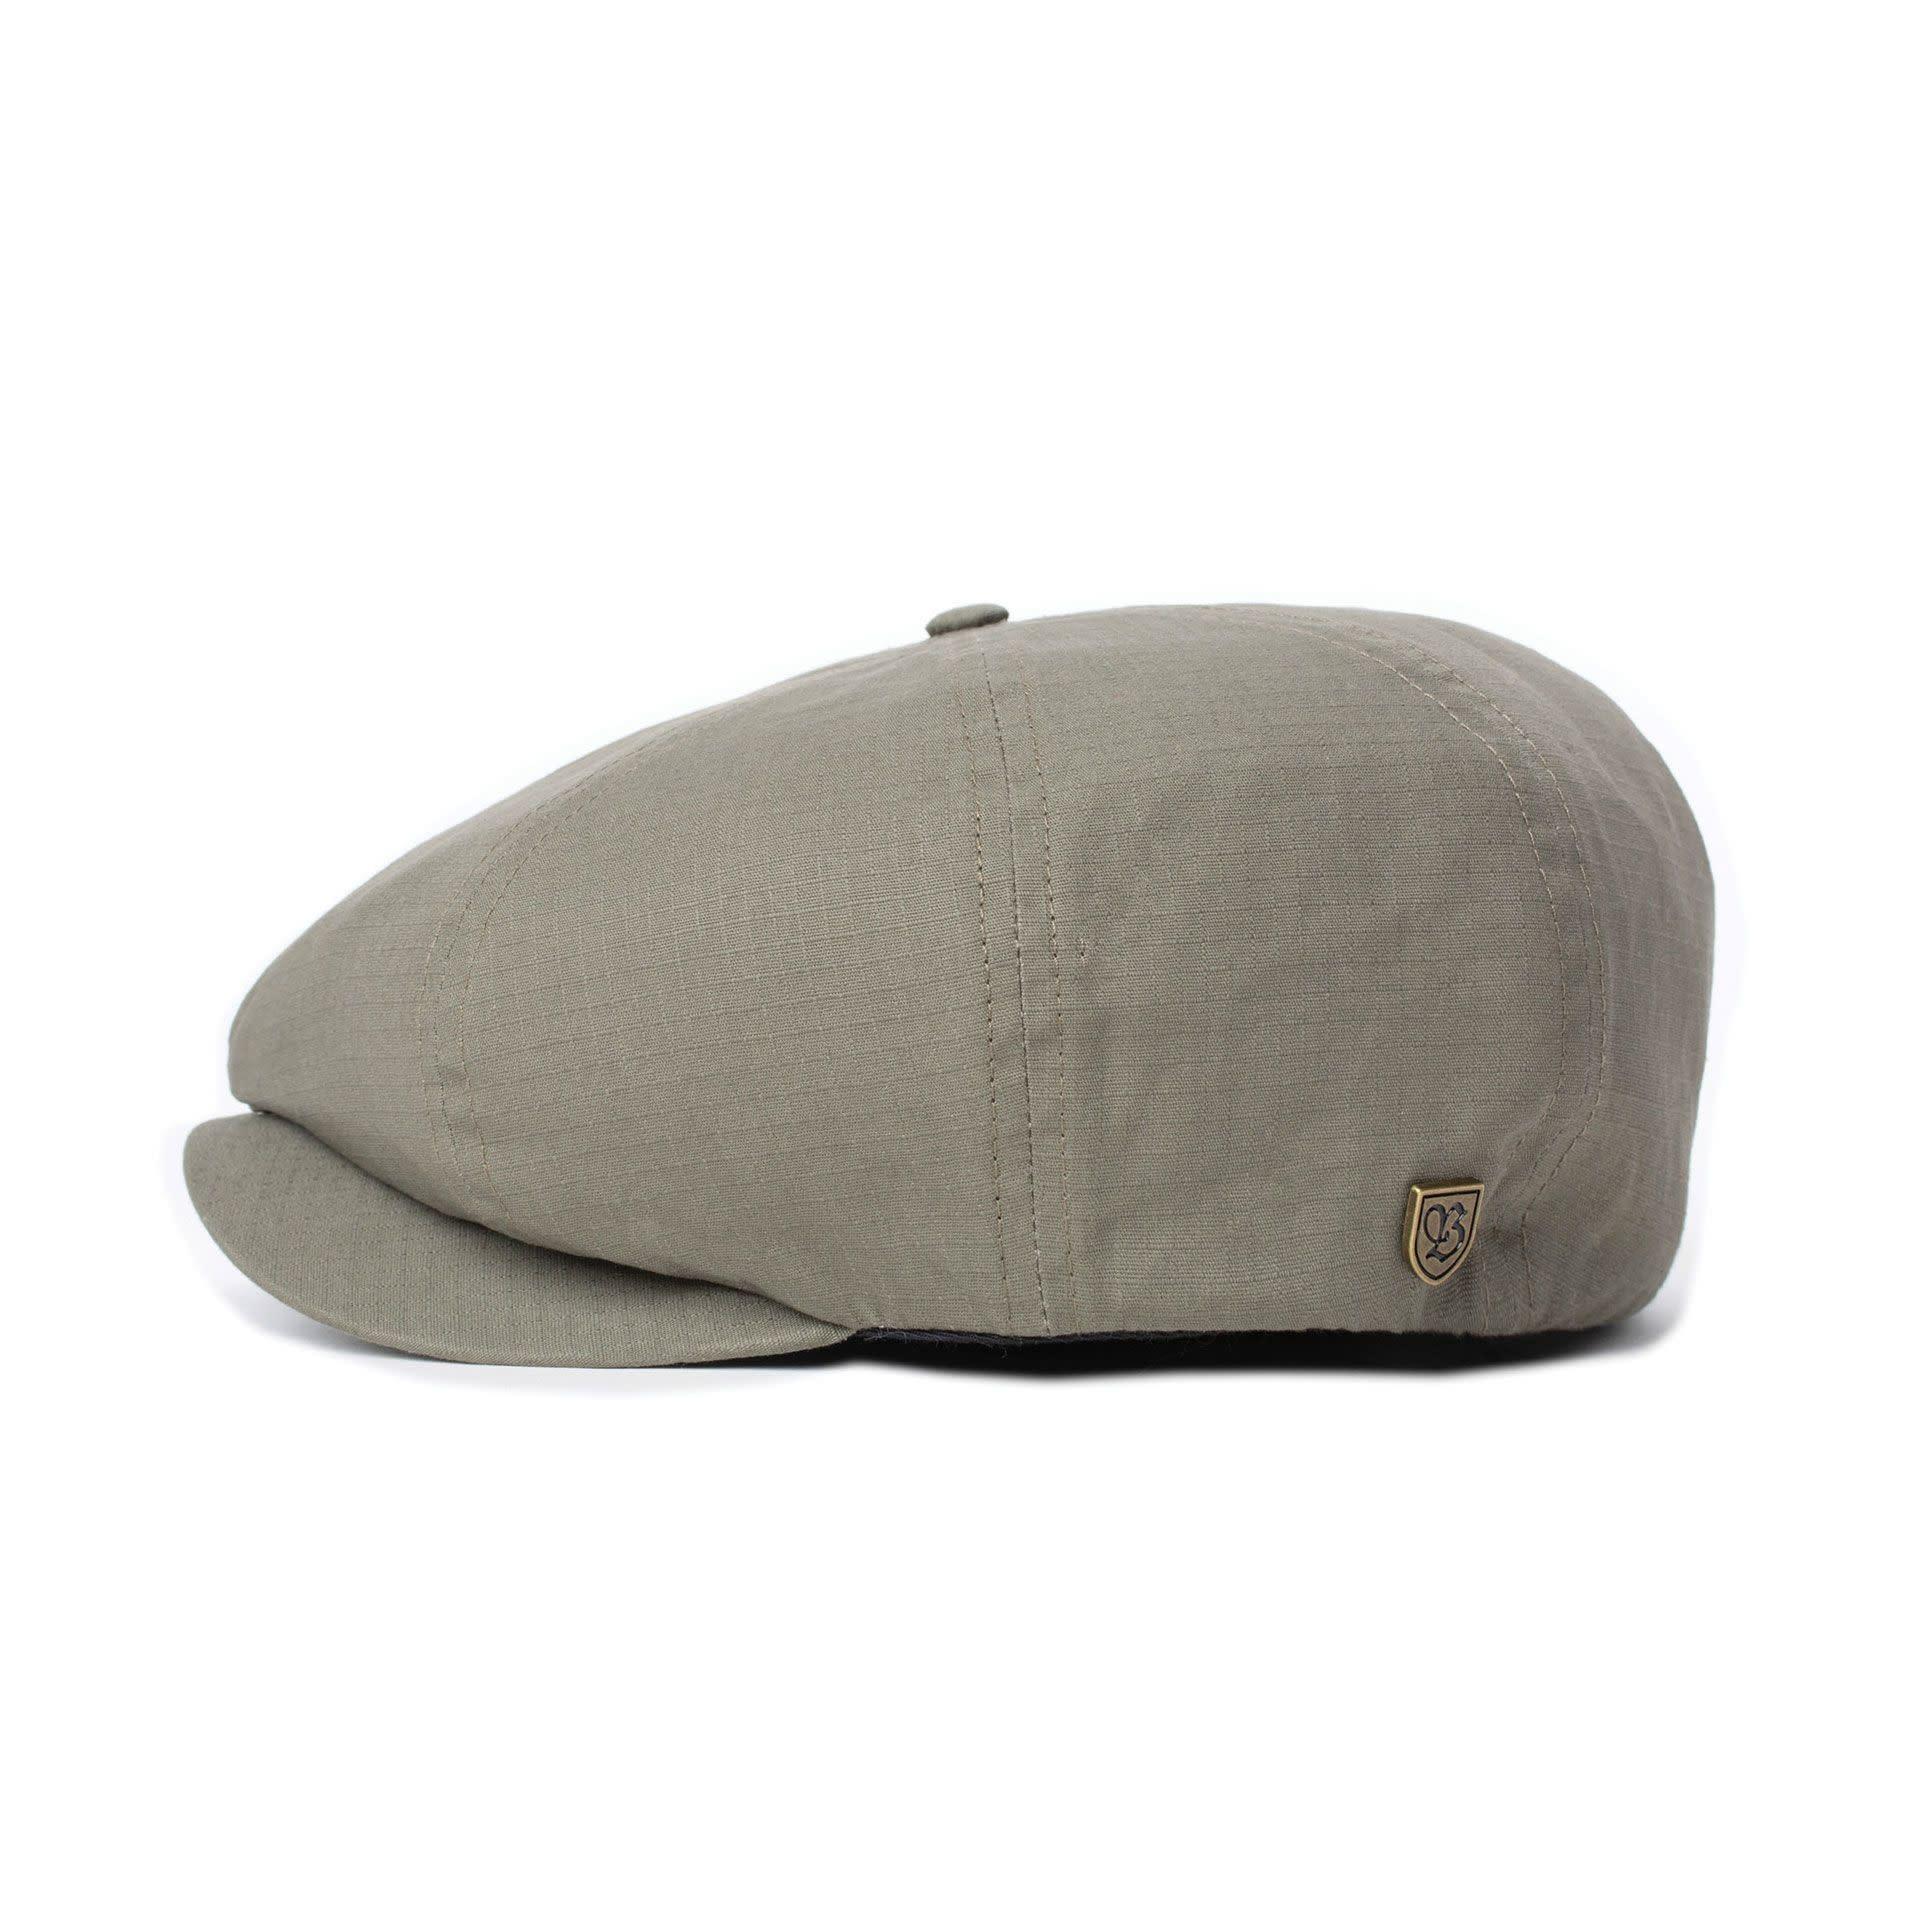 Brixton Brixton Brood Snap Cap - Dark Military Olive